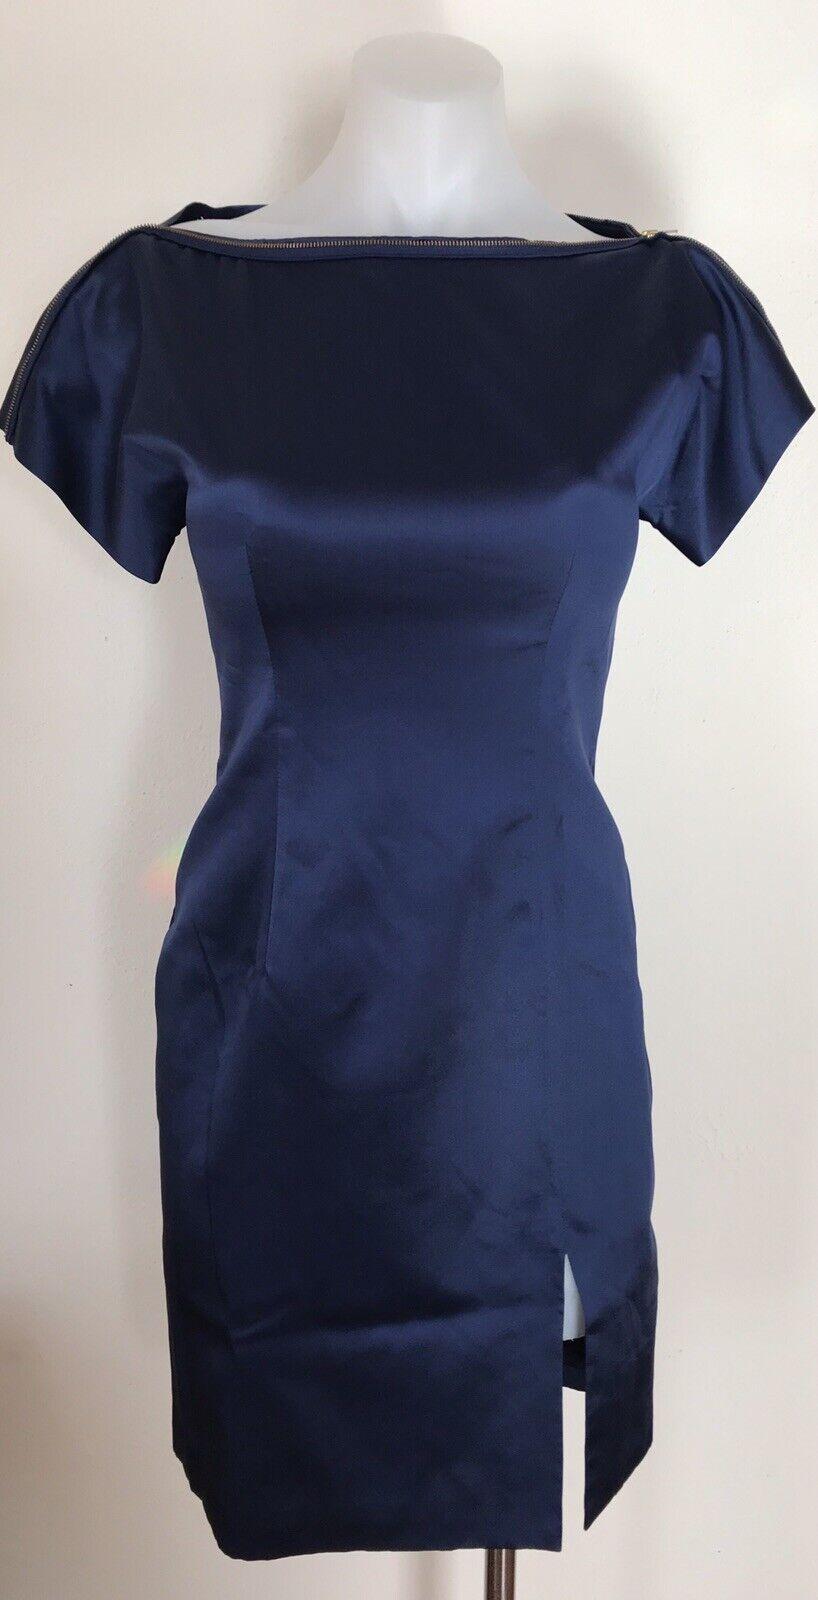 NWT Womens Vivienne Tam Silk Dress Gorgeous Glam Elegant Runway Size 0